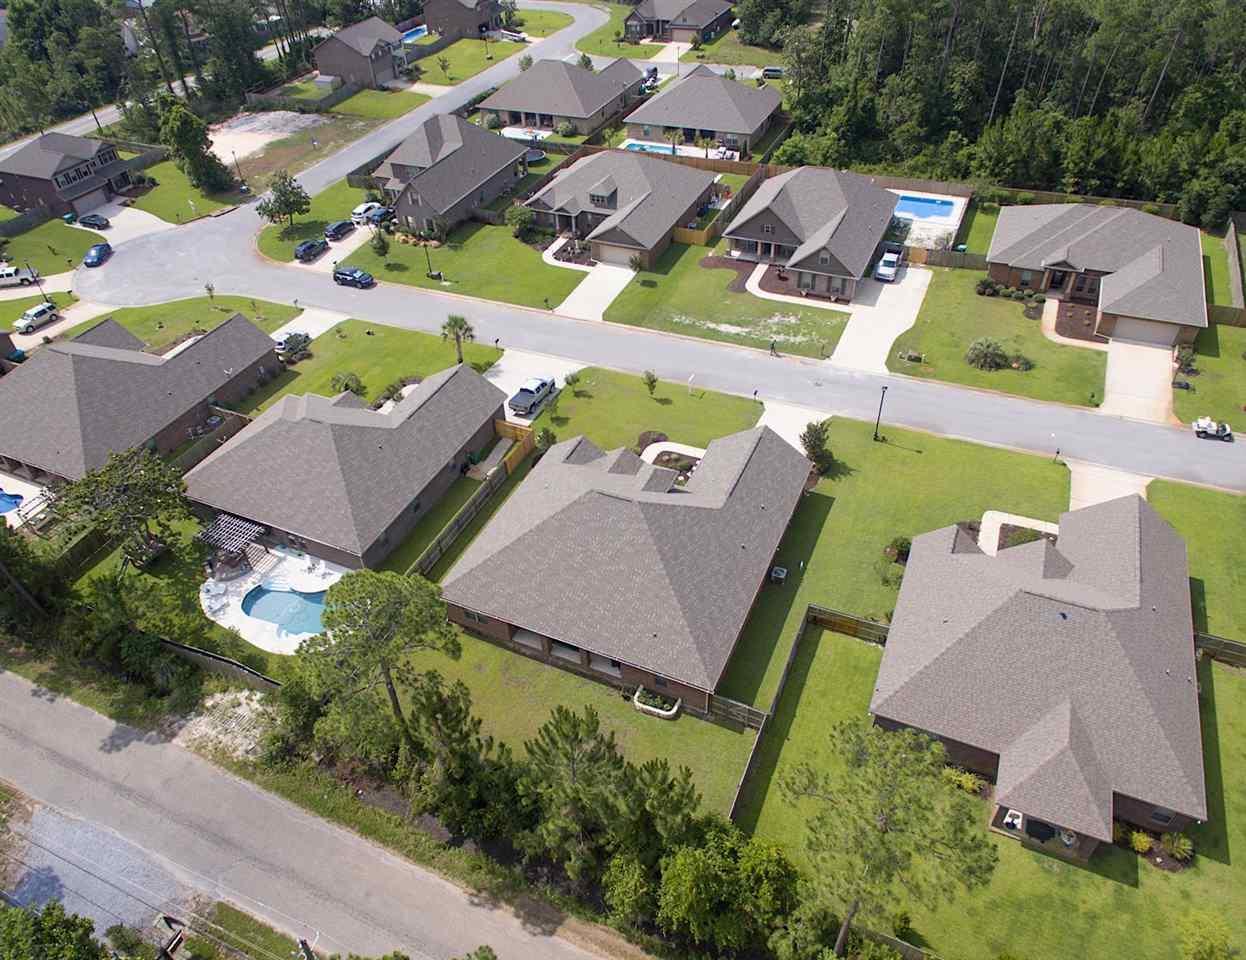 3018 Grand Palm Way, Gulf Breeze, FL 32563